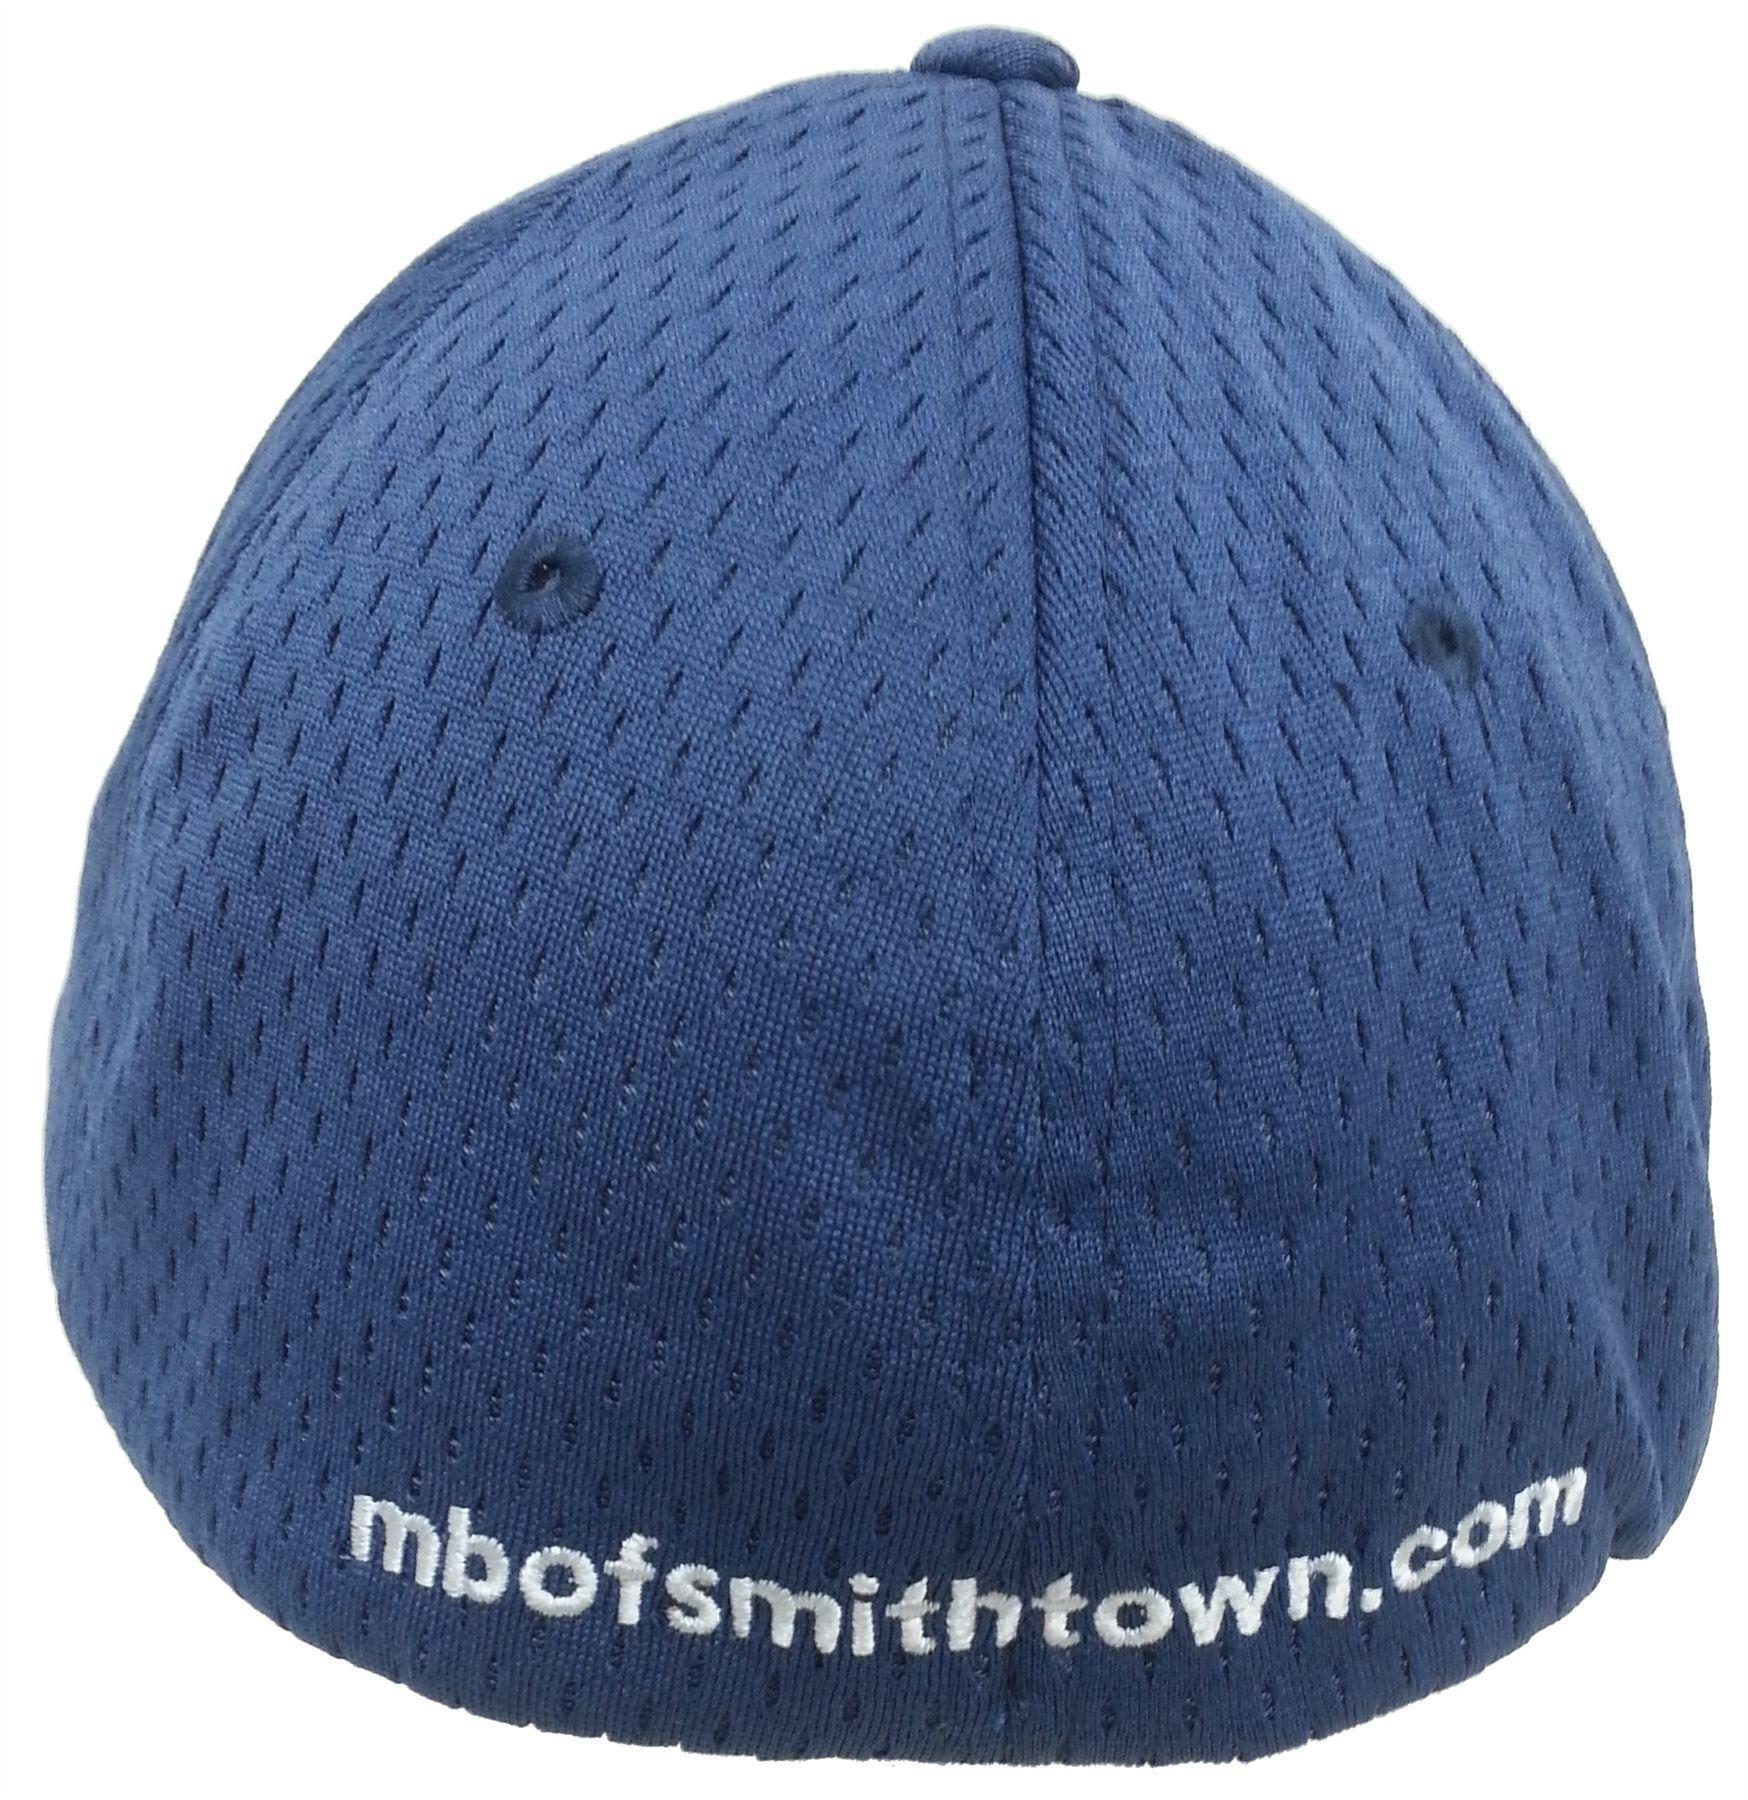 Mercedes benz black navy blue adult cotton mesh for Mercedes benz hat amazon